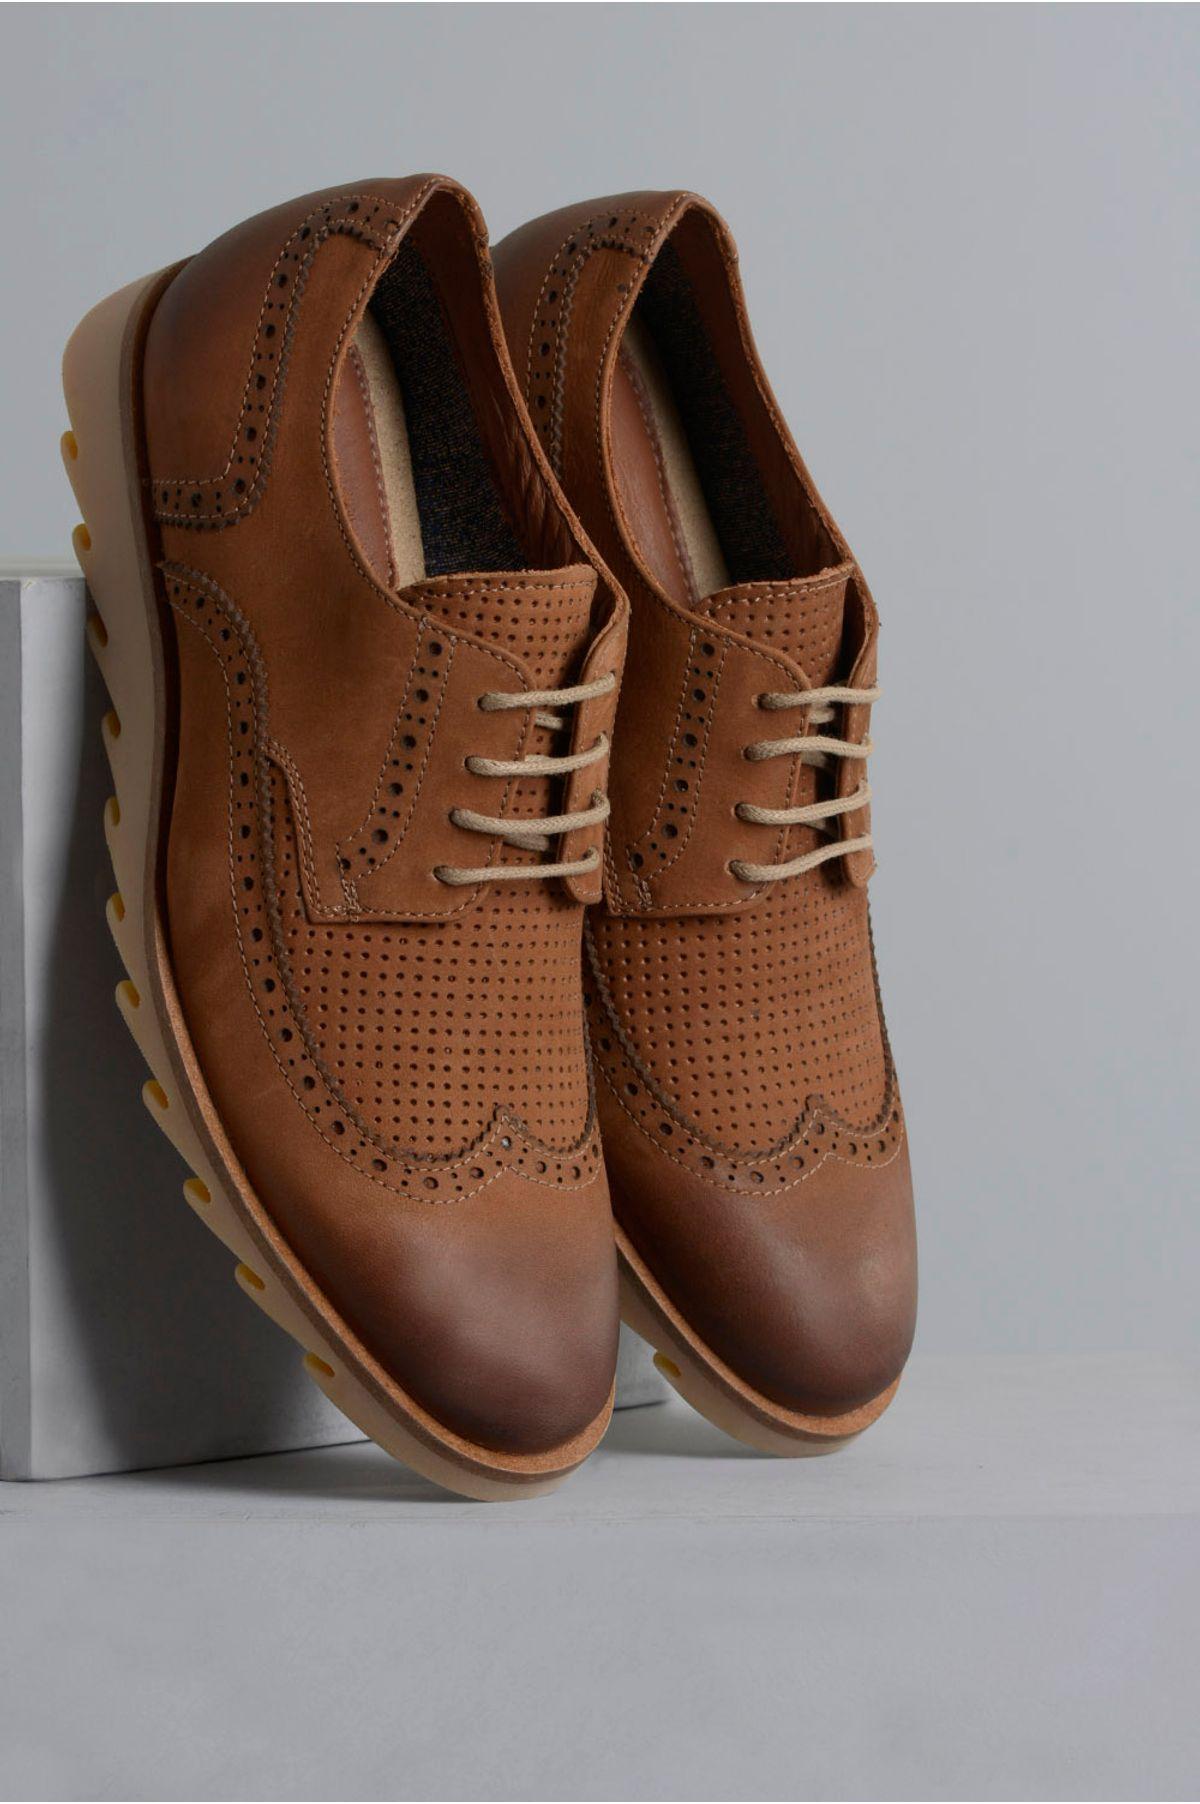 8b421ab9f Sapato Masculino Danilo Mundial CR-WHISKY - Mundial Calçados